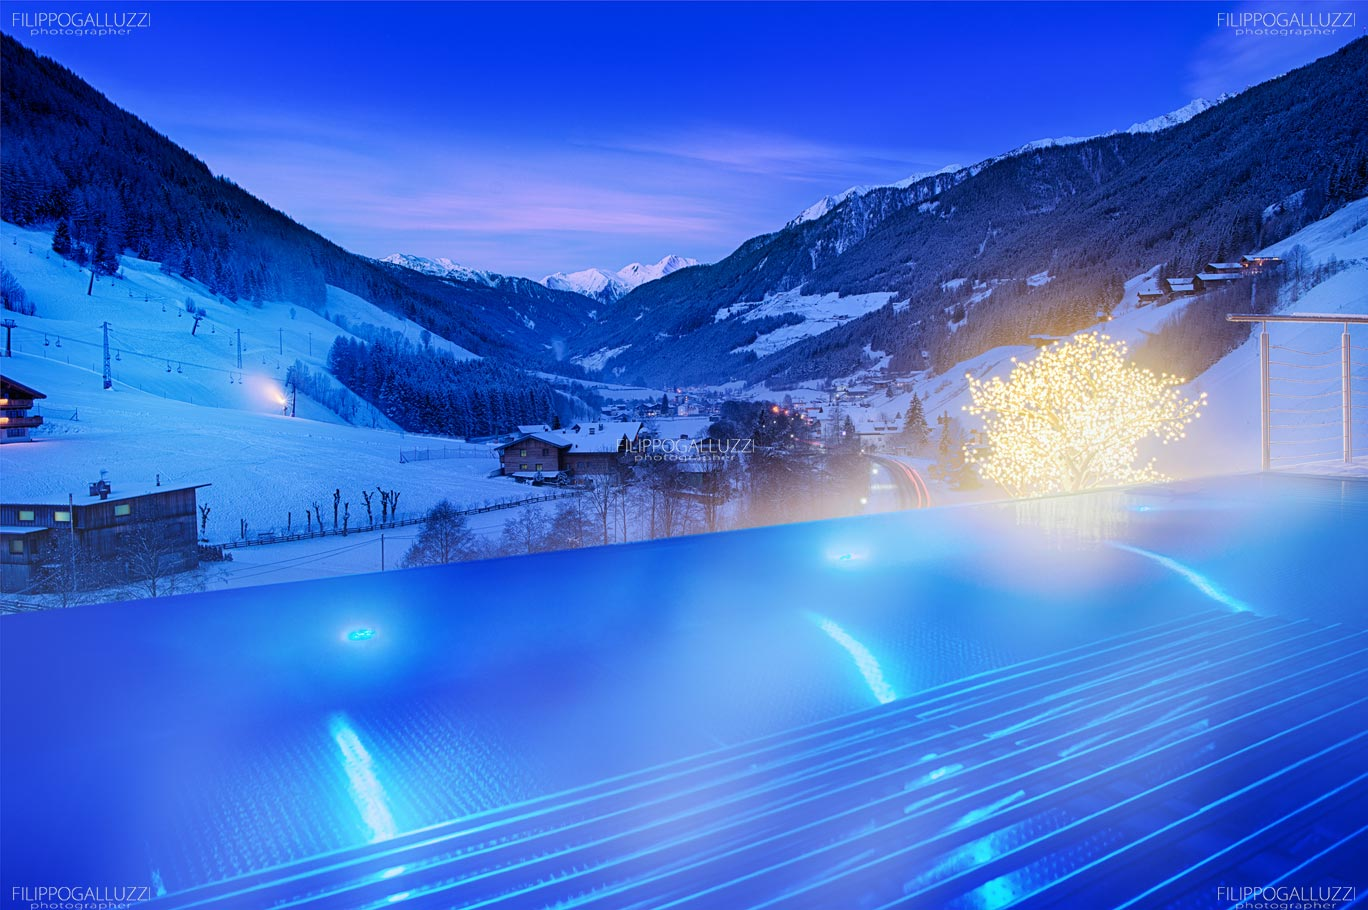 Fotografia Hotel Wellnes Sky Pool  Alpenschloessl & Linderhof Ahrntal